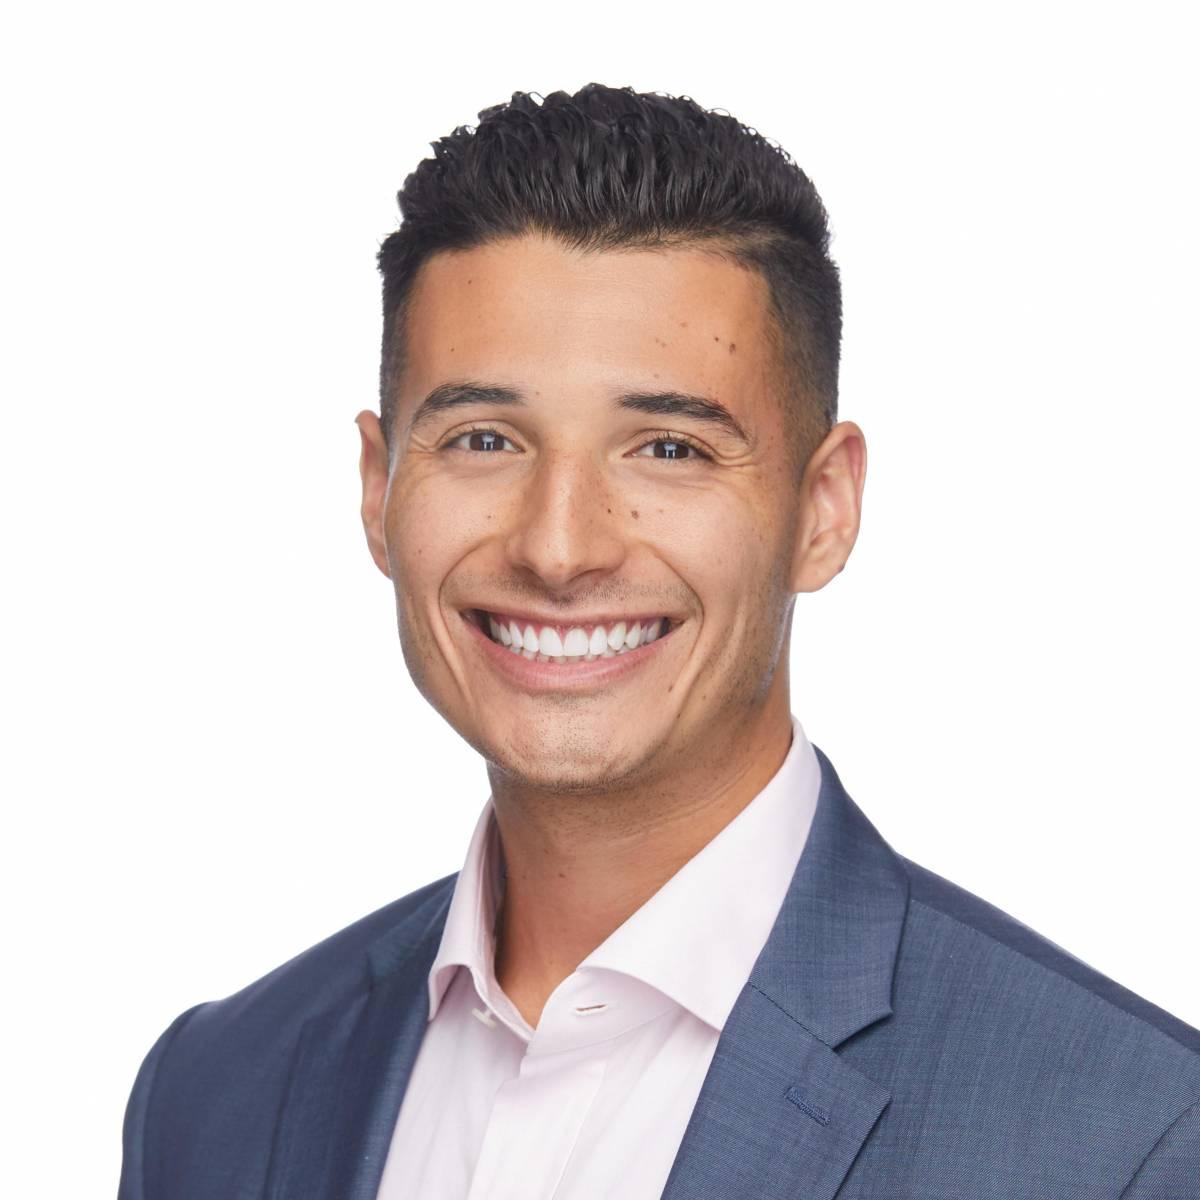 Michael Dallesandro